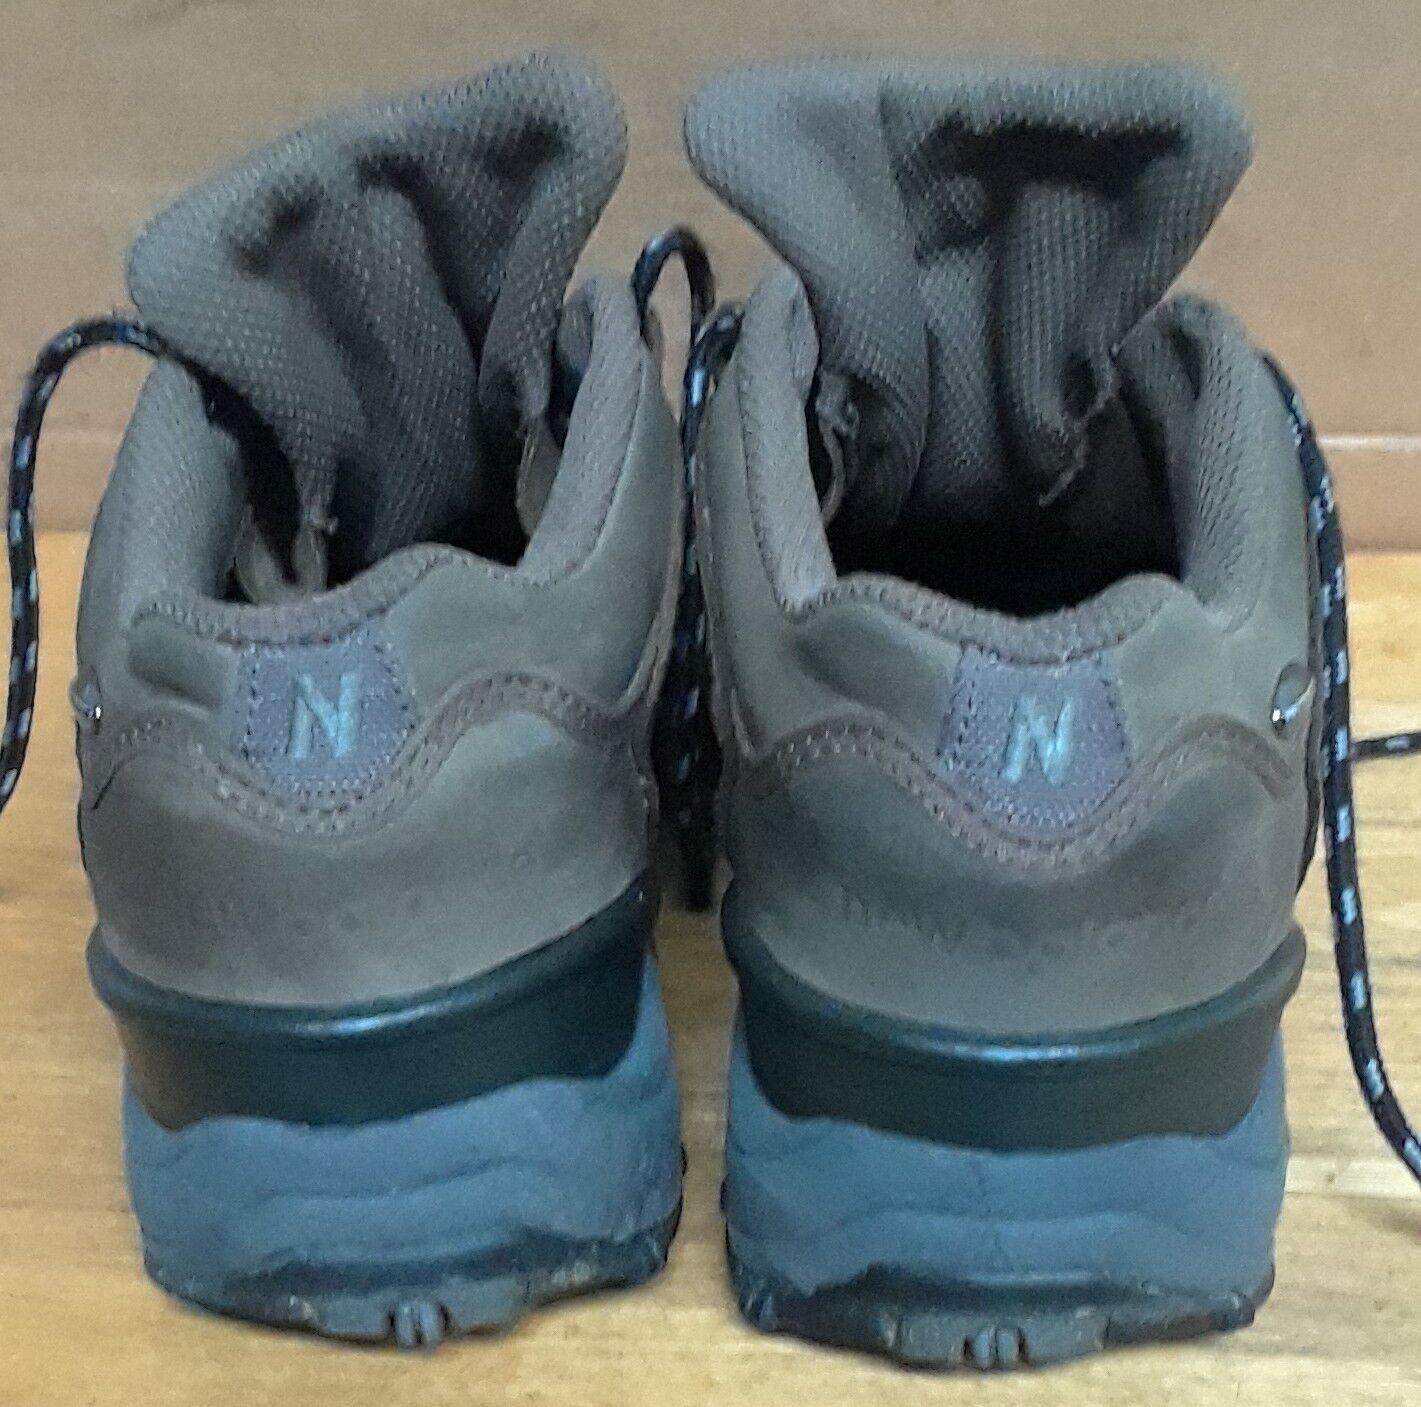 NEW BALANCE 961 961 961 Leather Hiking Walking Trail shoes Waterproof Women's Sz 10 be1936